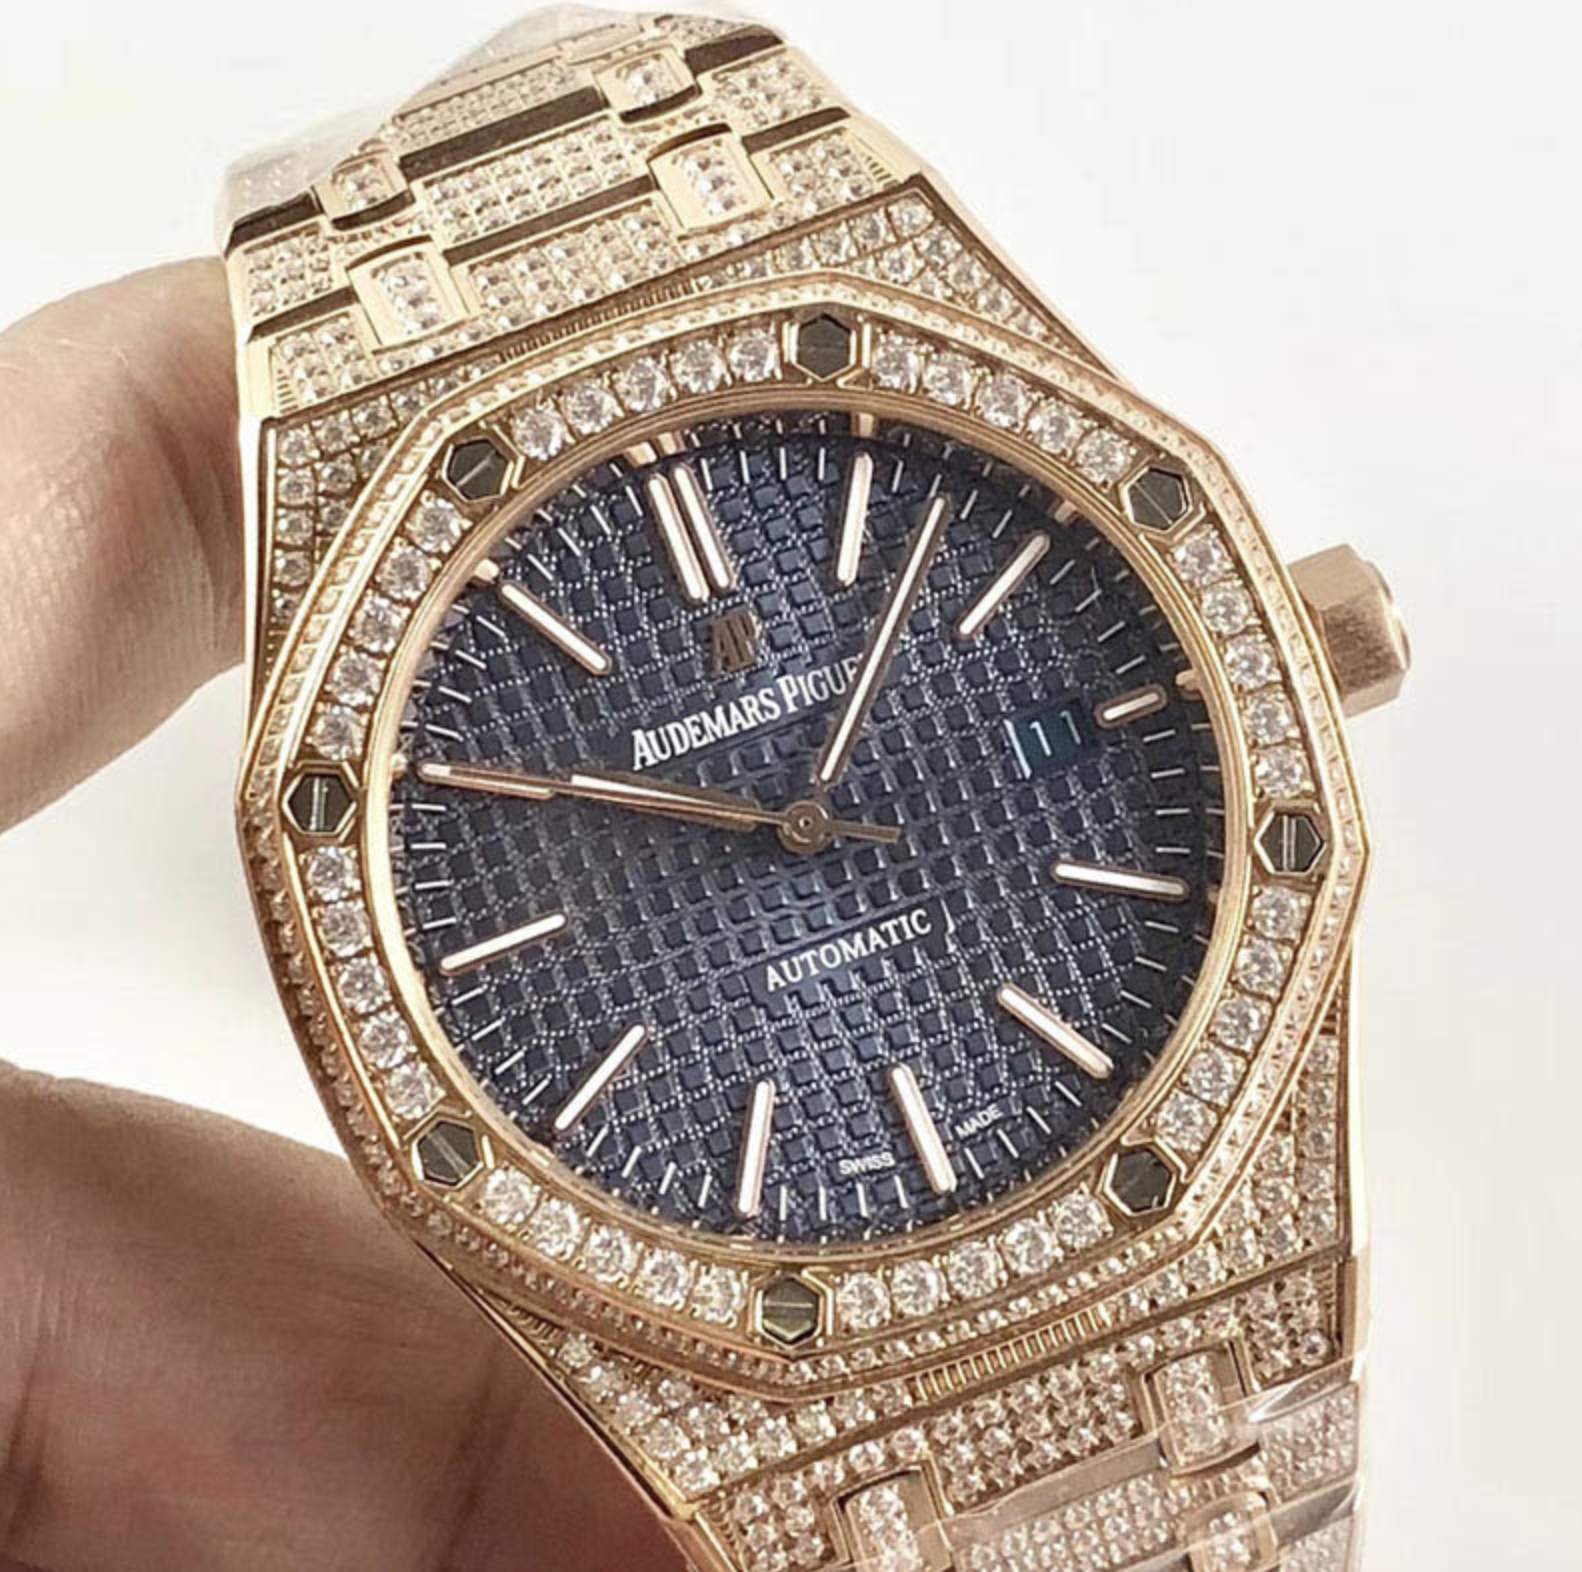 Audemars piguet replica royal oak 15400ST 41mm rose gold full paved diamonds blue dial